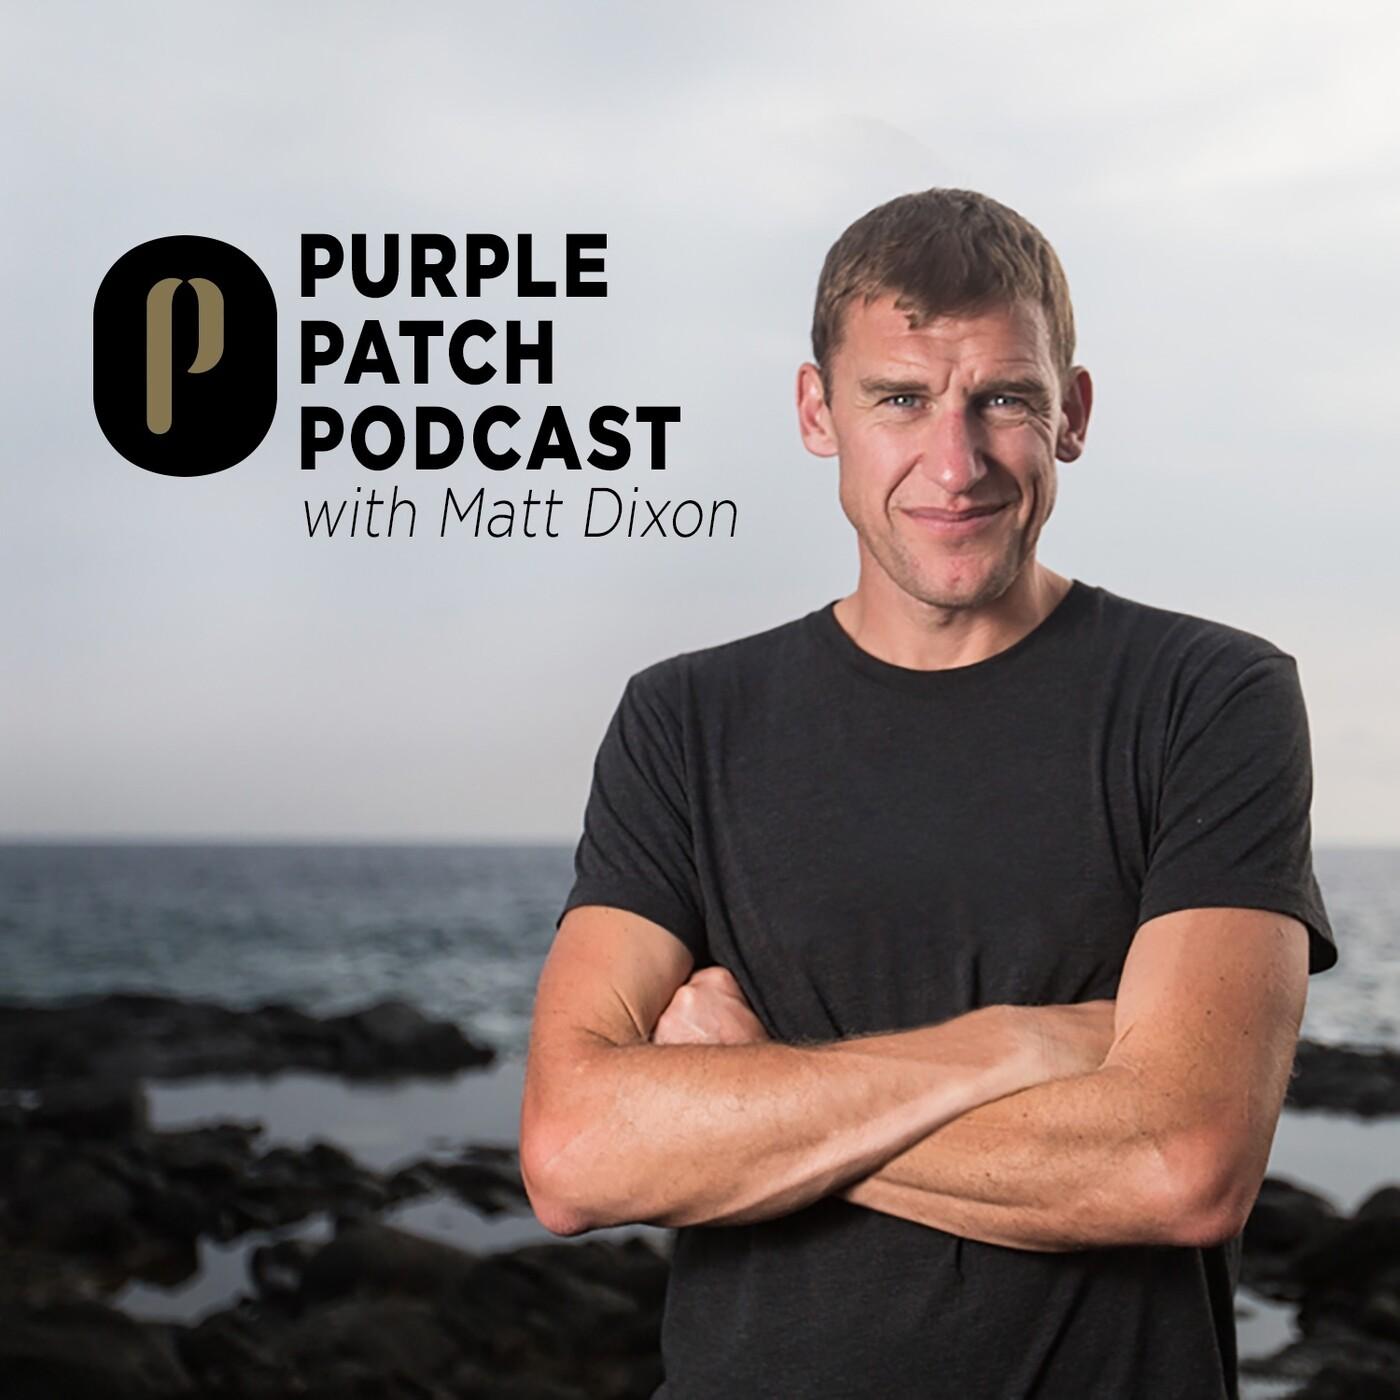 Purple Patch Podcast - An Introduction from Coach Matt Dixon